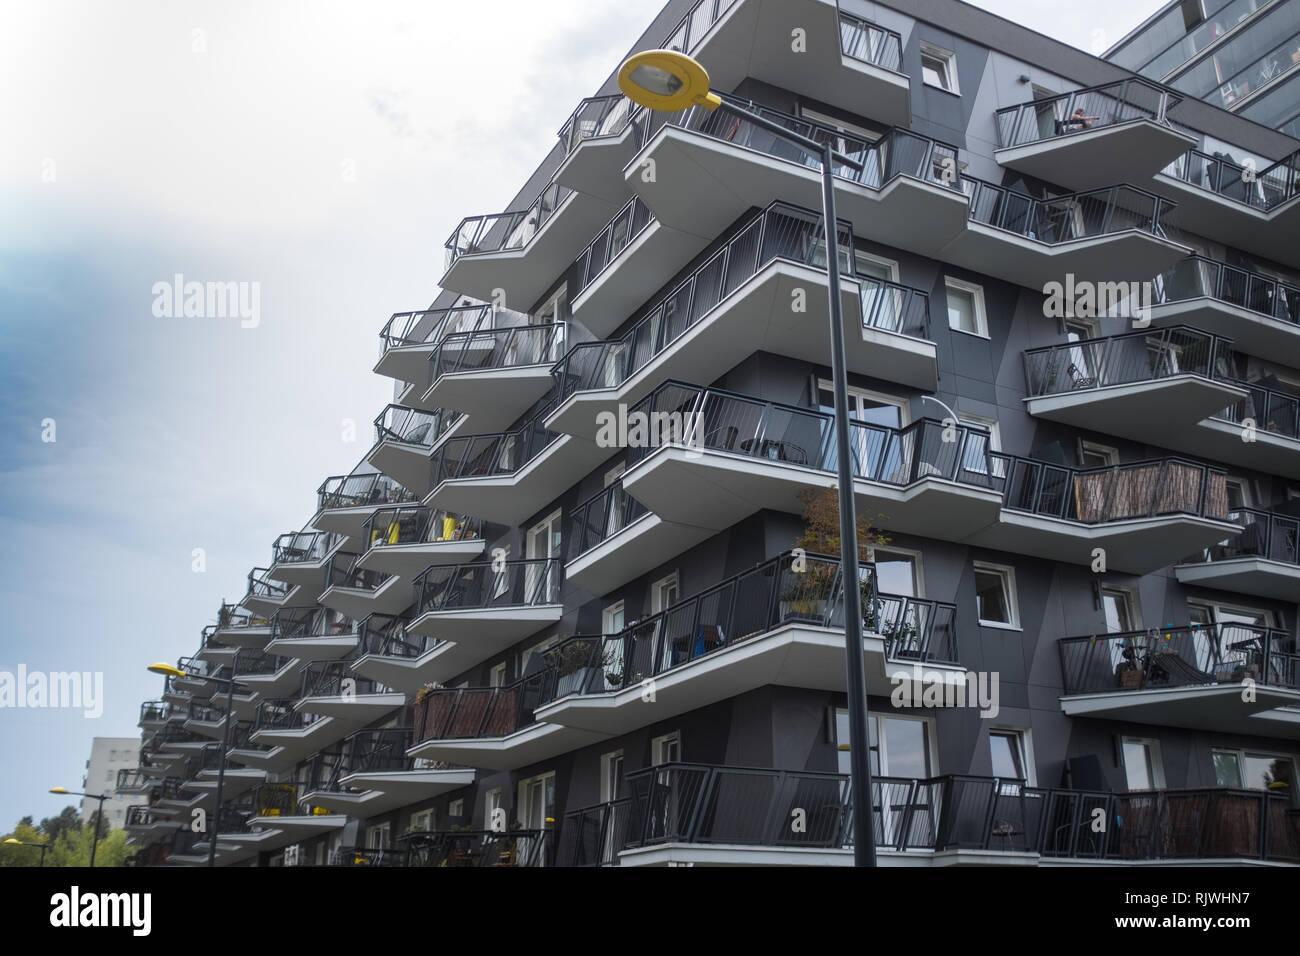 modern apartment block with balcony's Stock Photo